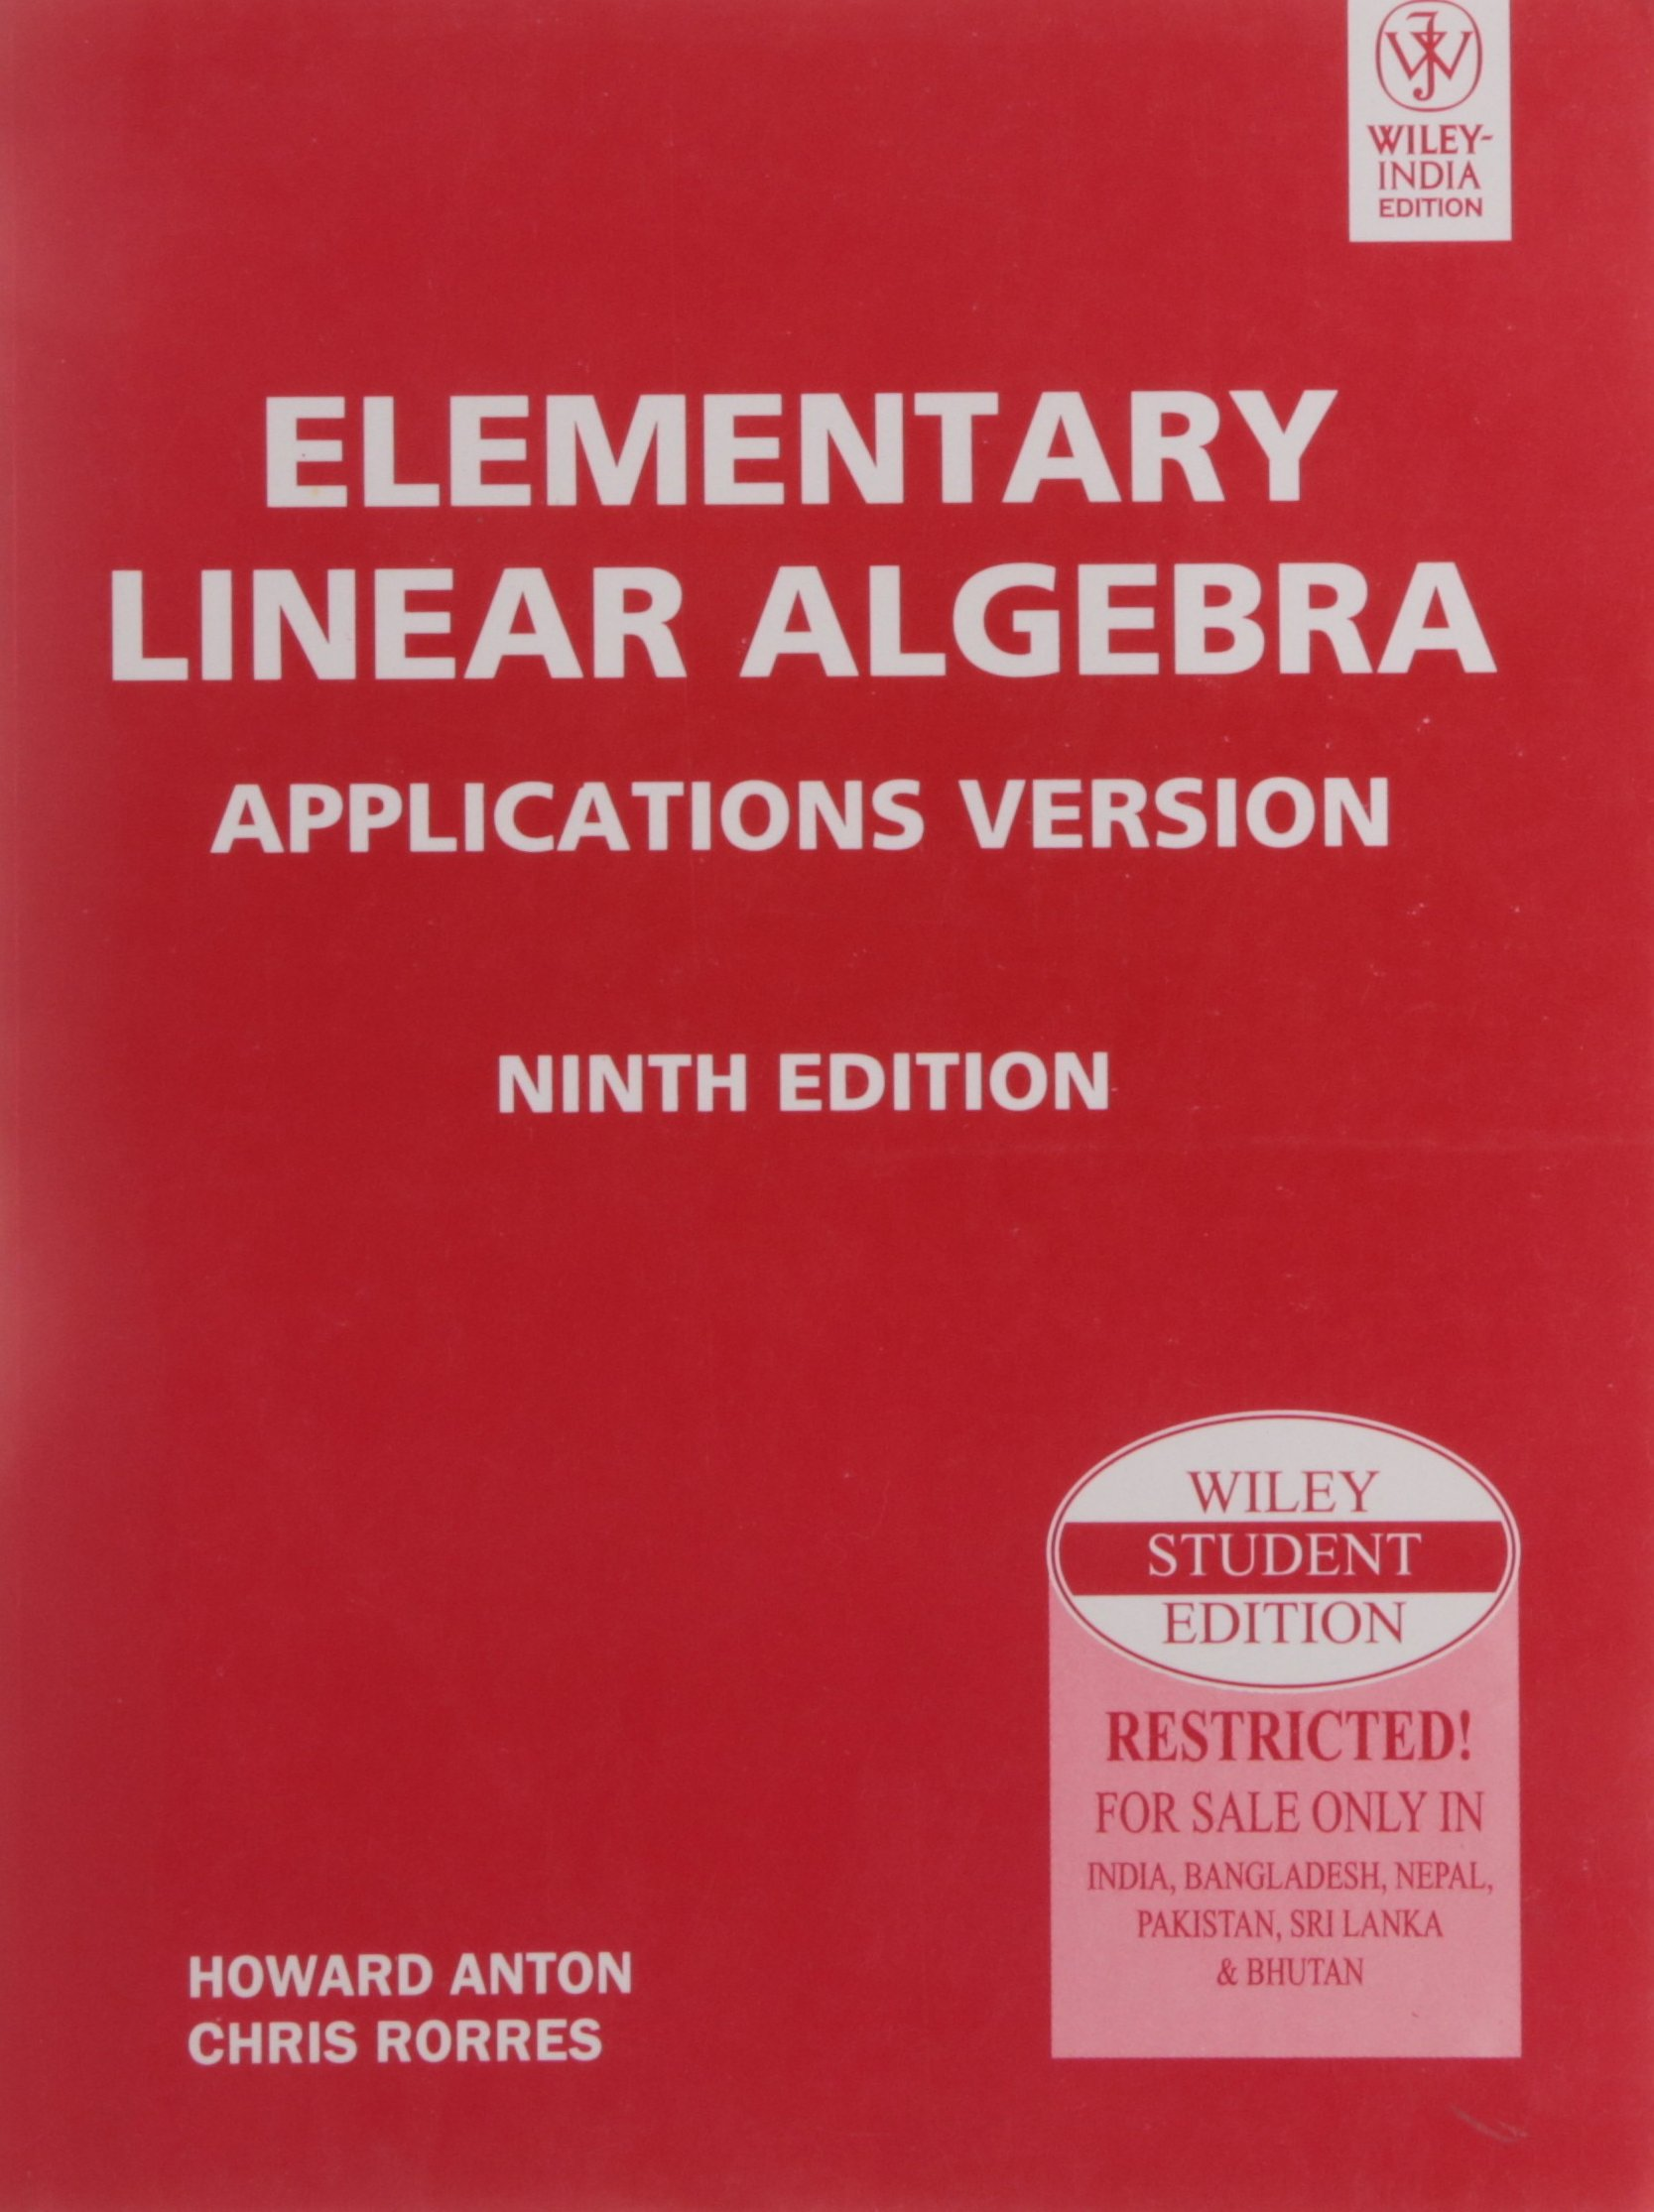 Elementary Linear Algebra Applications Version, 9Th Ed: Howard Anton:  9788126518692: Amazon.com: Books